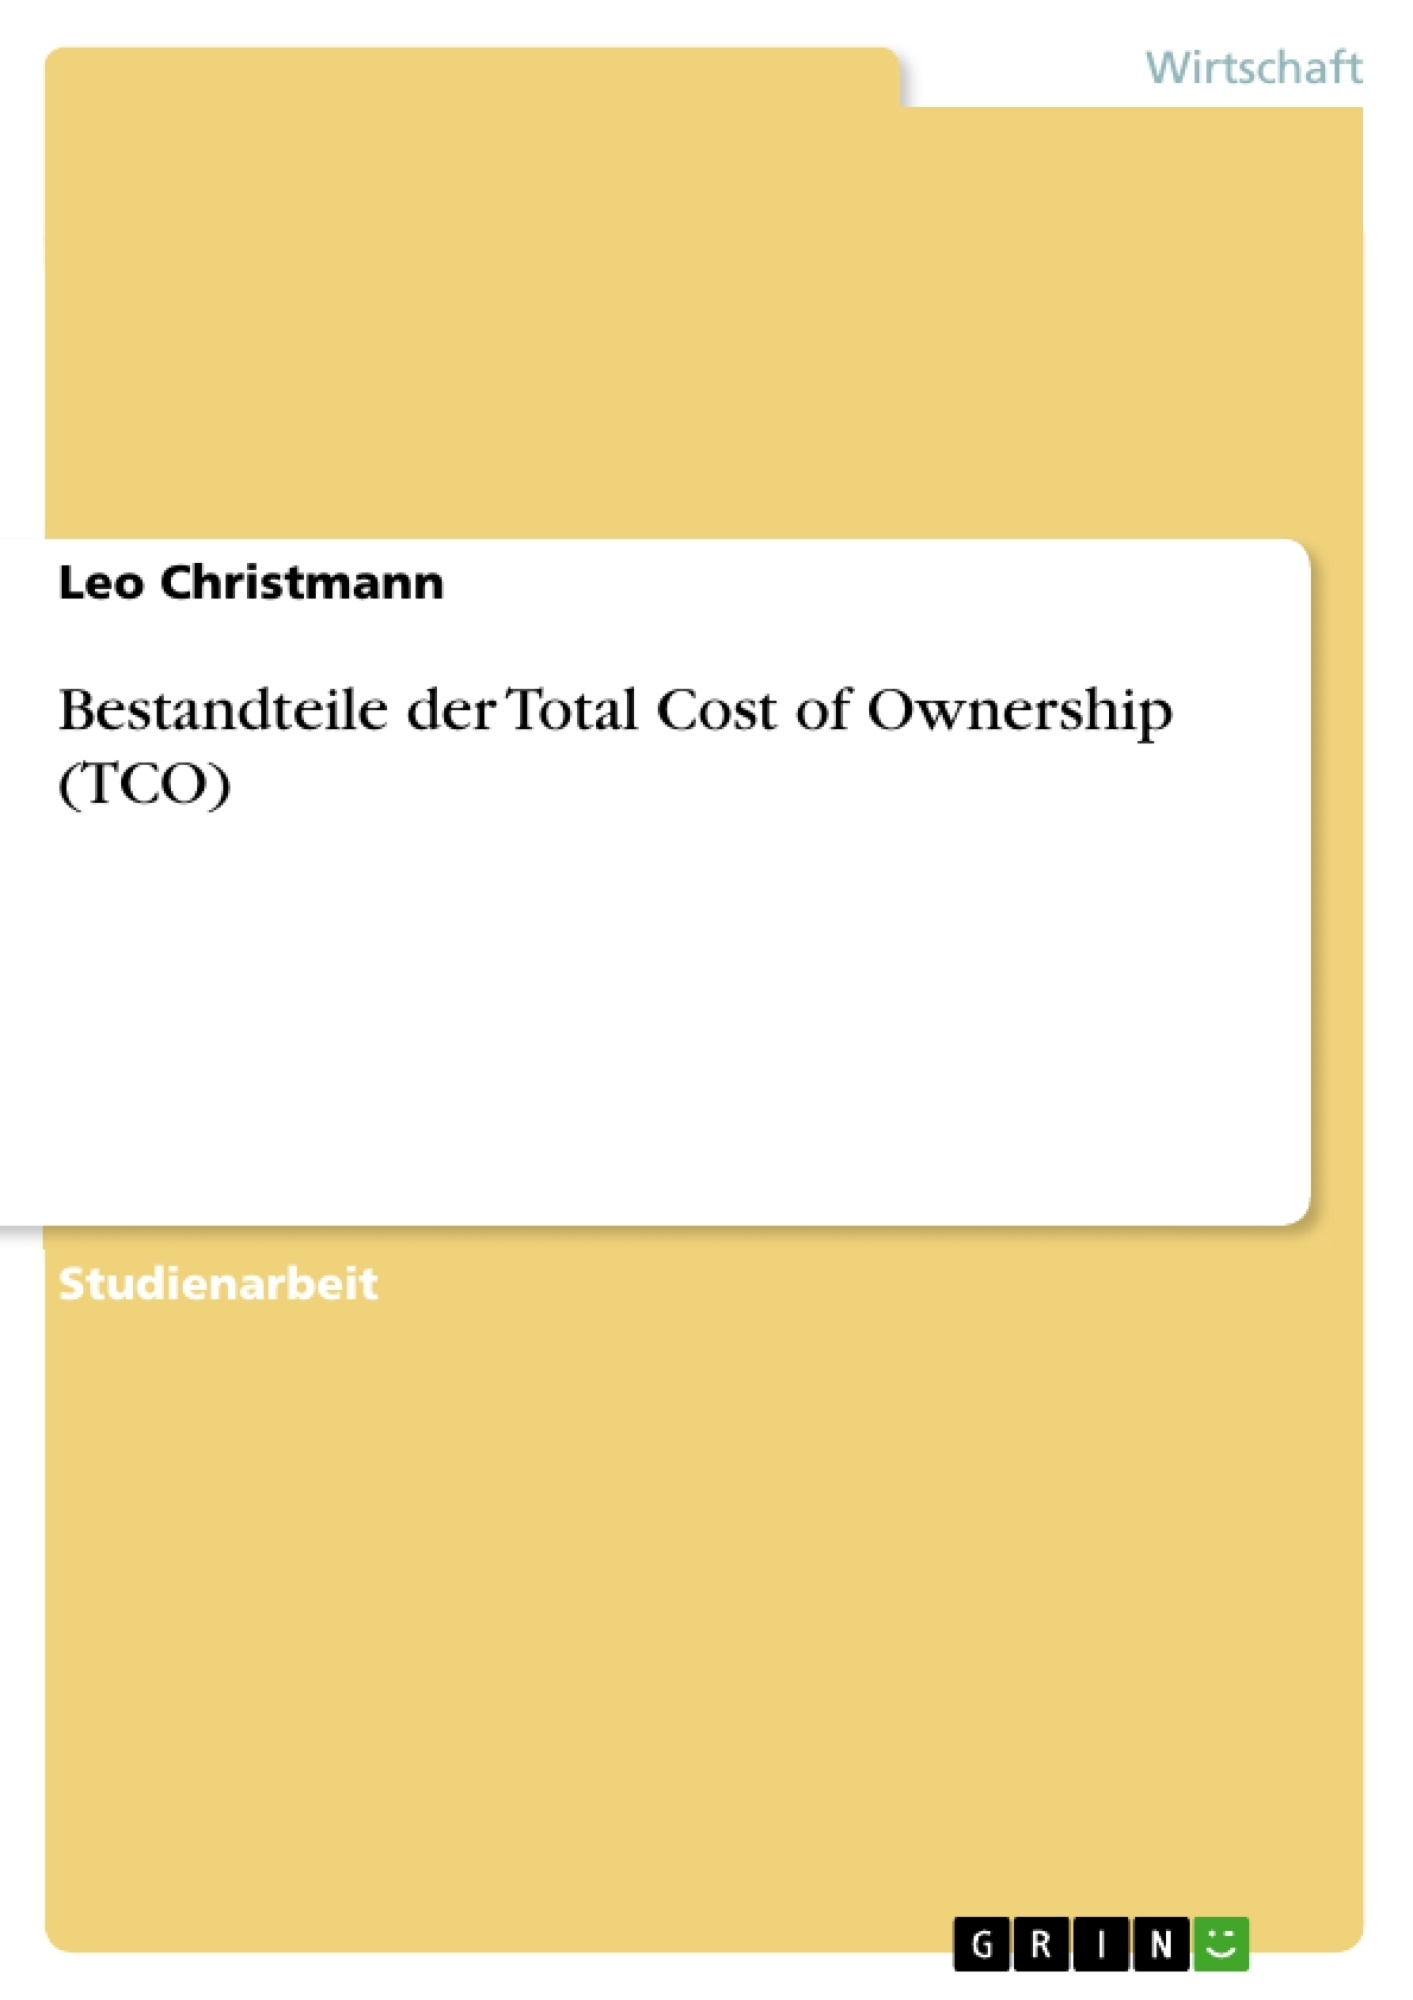 Titel: Bestandteile der Total Cost of Ownership (TCO)